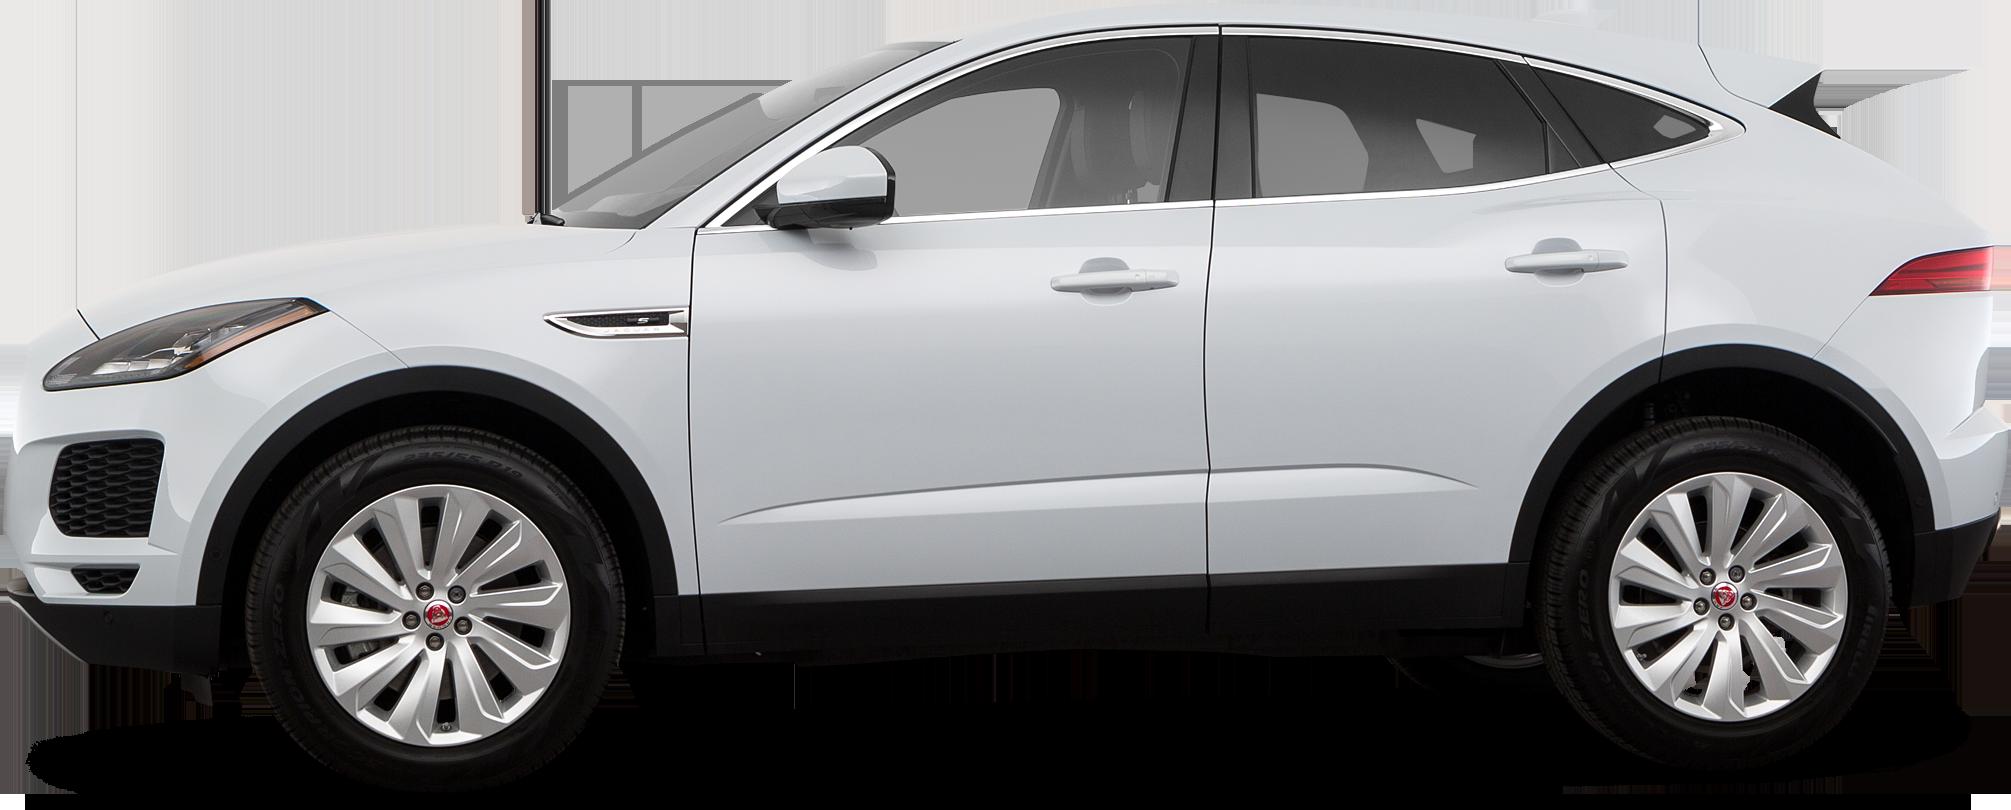 2016 Jaguar XJR | Jaguar Peabody | New Jaguar Cars Near Boston, MA